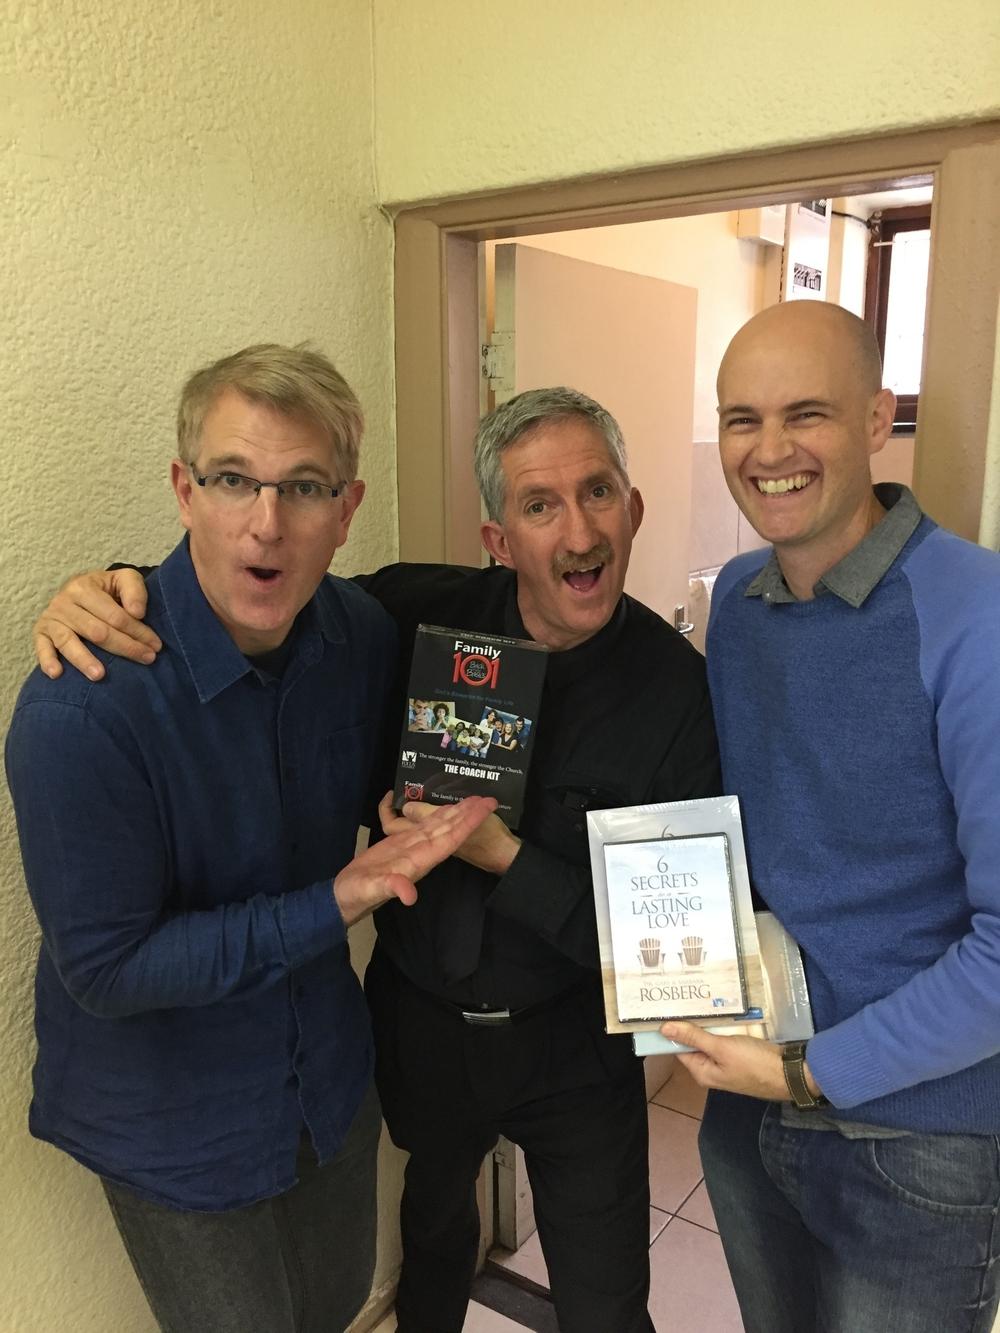 CCFM Radio Team-Jonathan, Sean, and Graeme-FOTF showcasing Church Kits.jpg